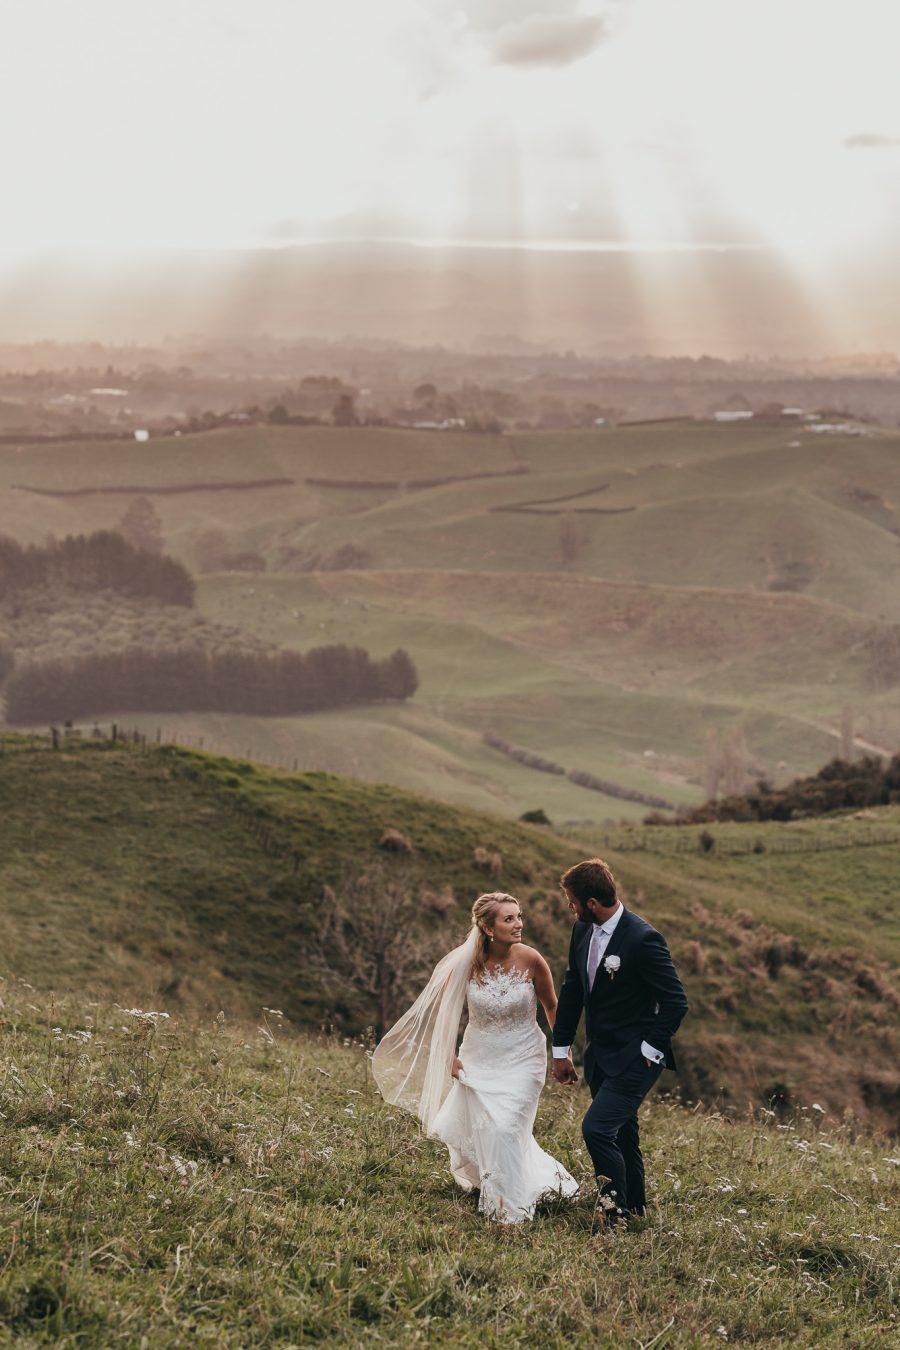 Jodi and Nick walking on their wedding day on the hills above Tauranga